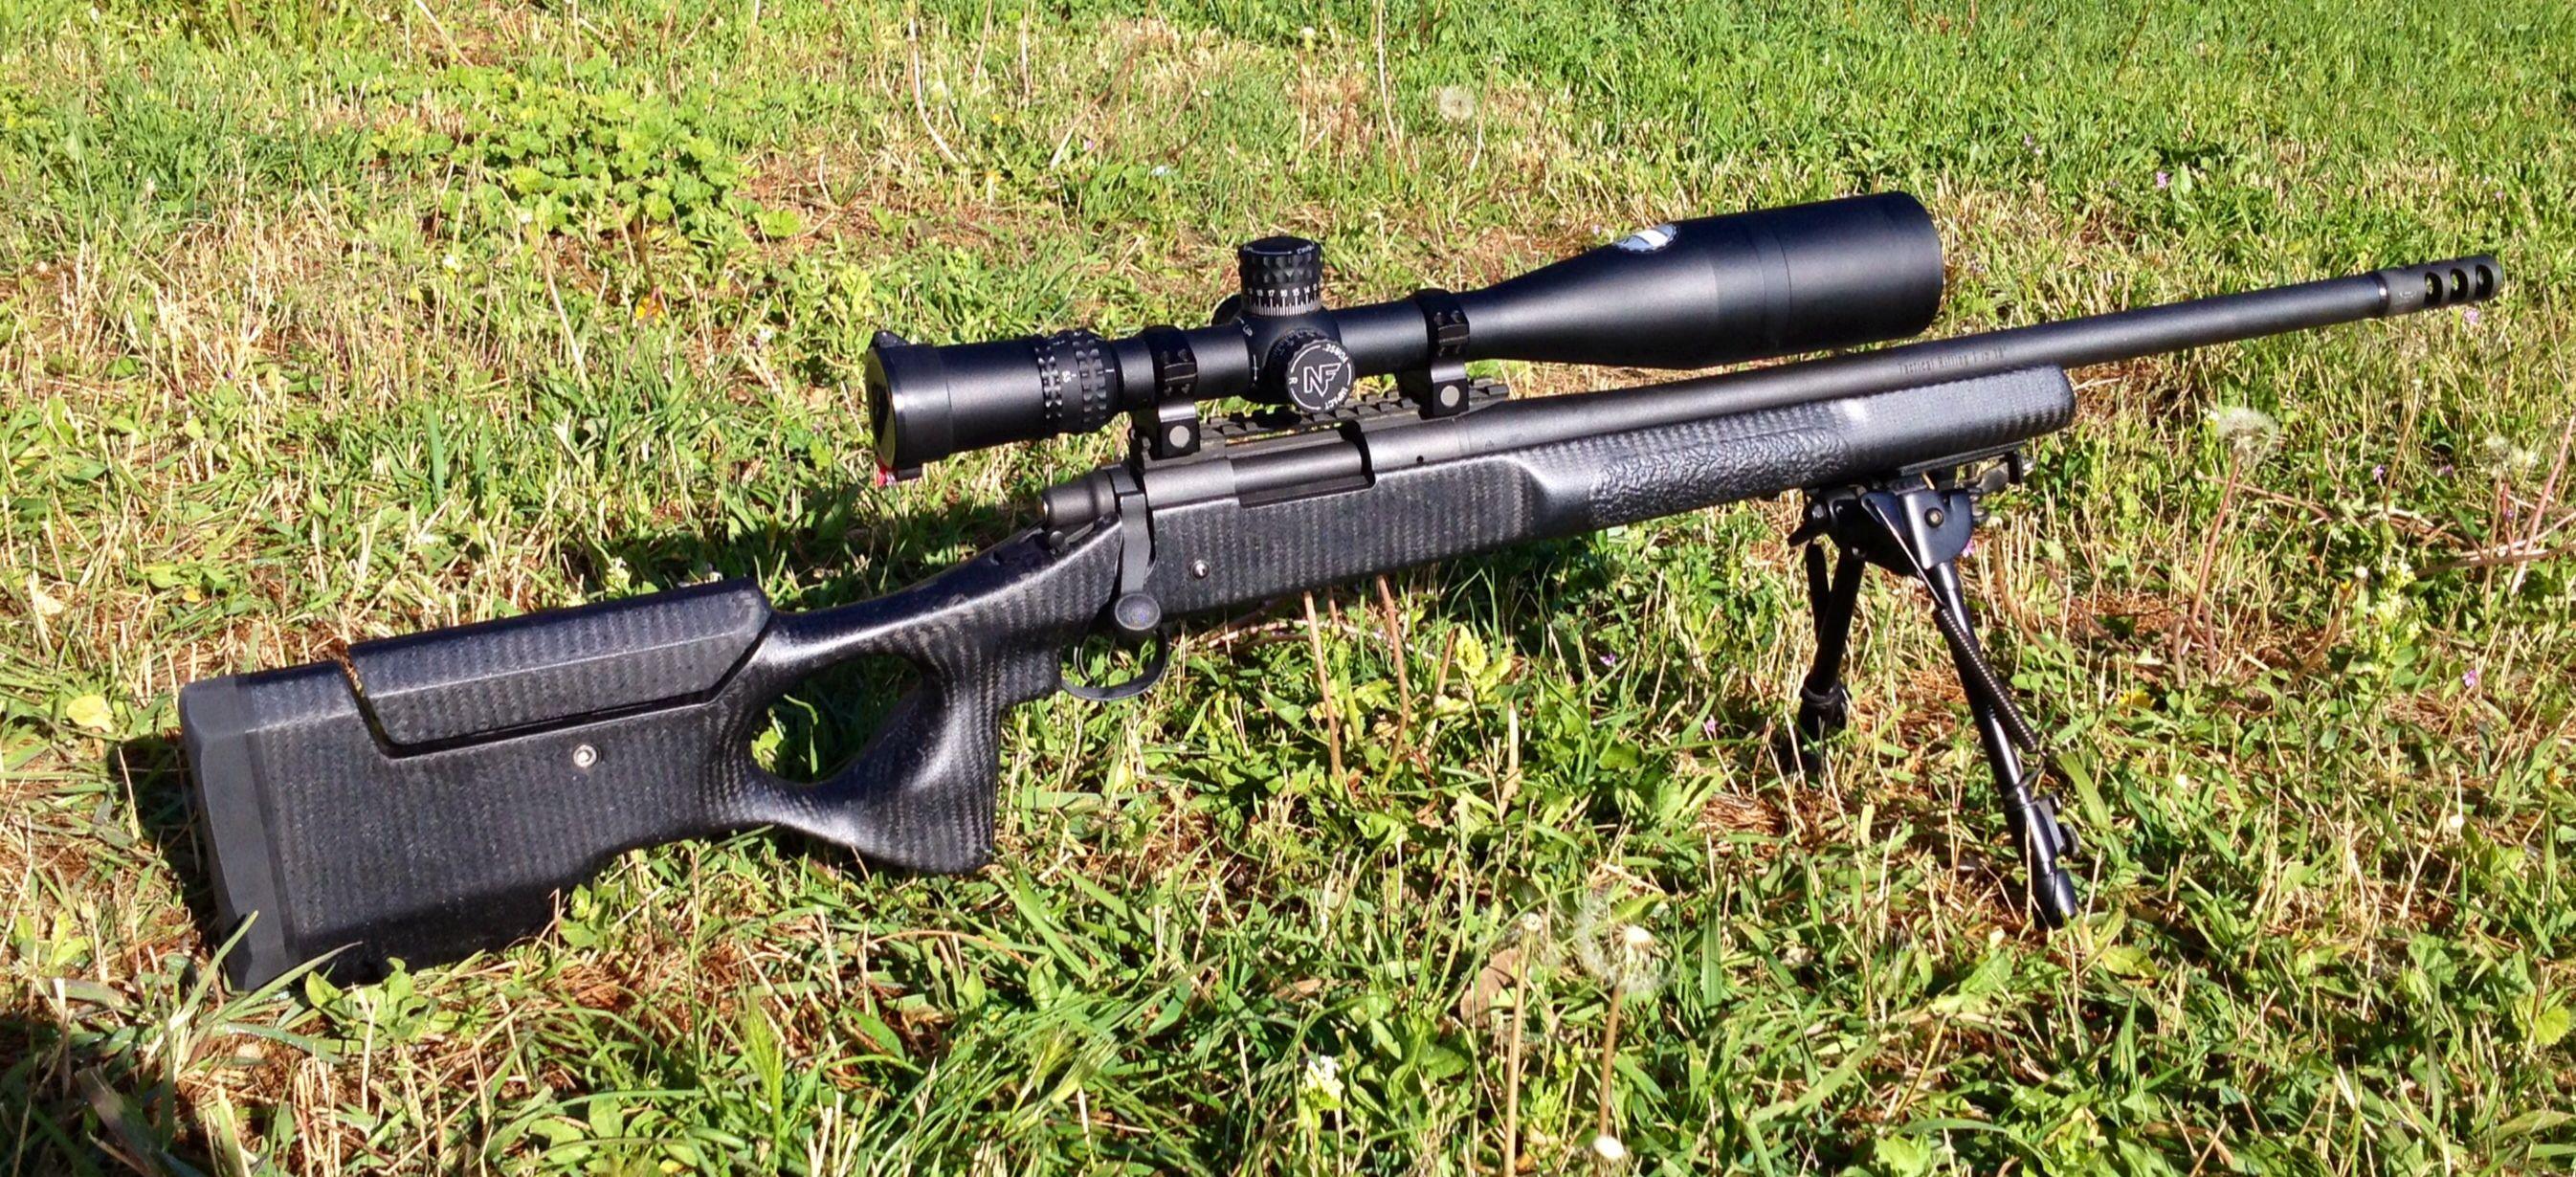 Manners rifle stock T5A | Rifles | Guns, Rifle stock, Firearms